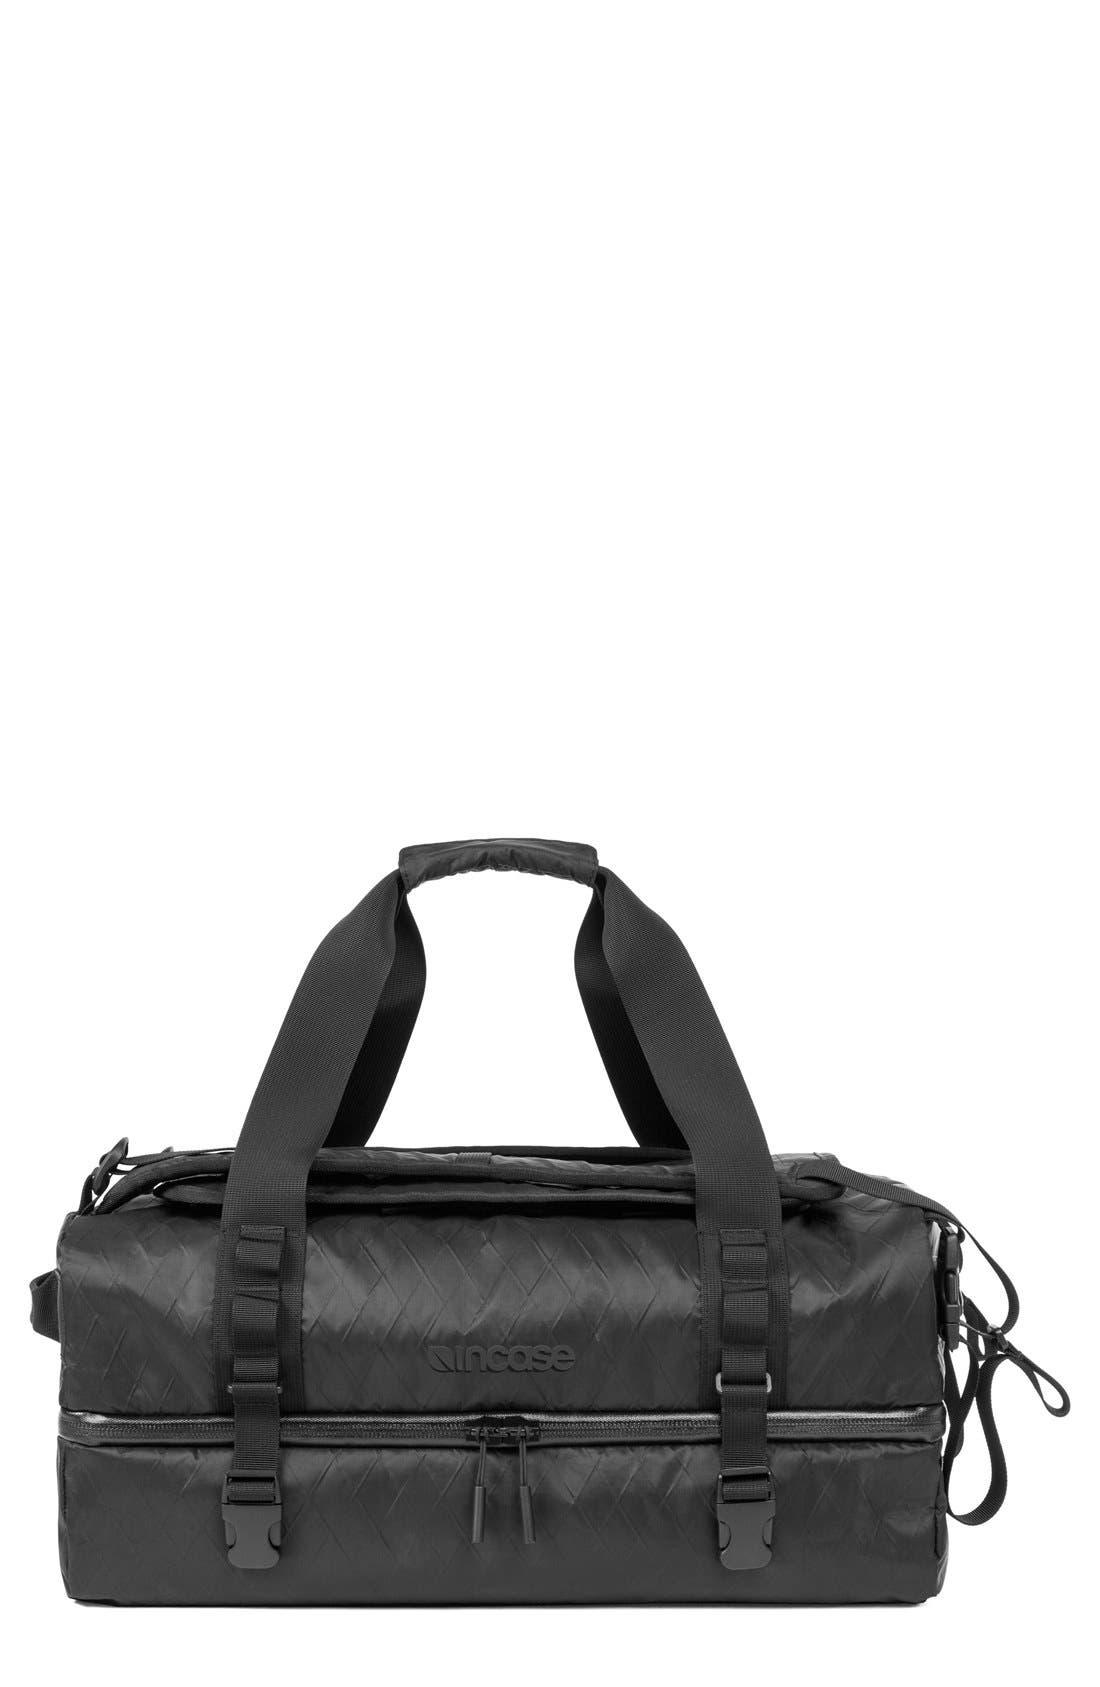 TRACTO Diamond Wire Split Travel Bag,                             Main thumbnail 1, color,                             Black